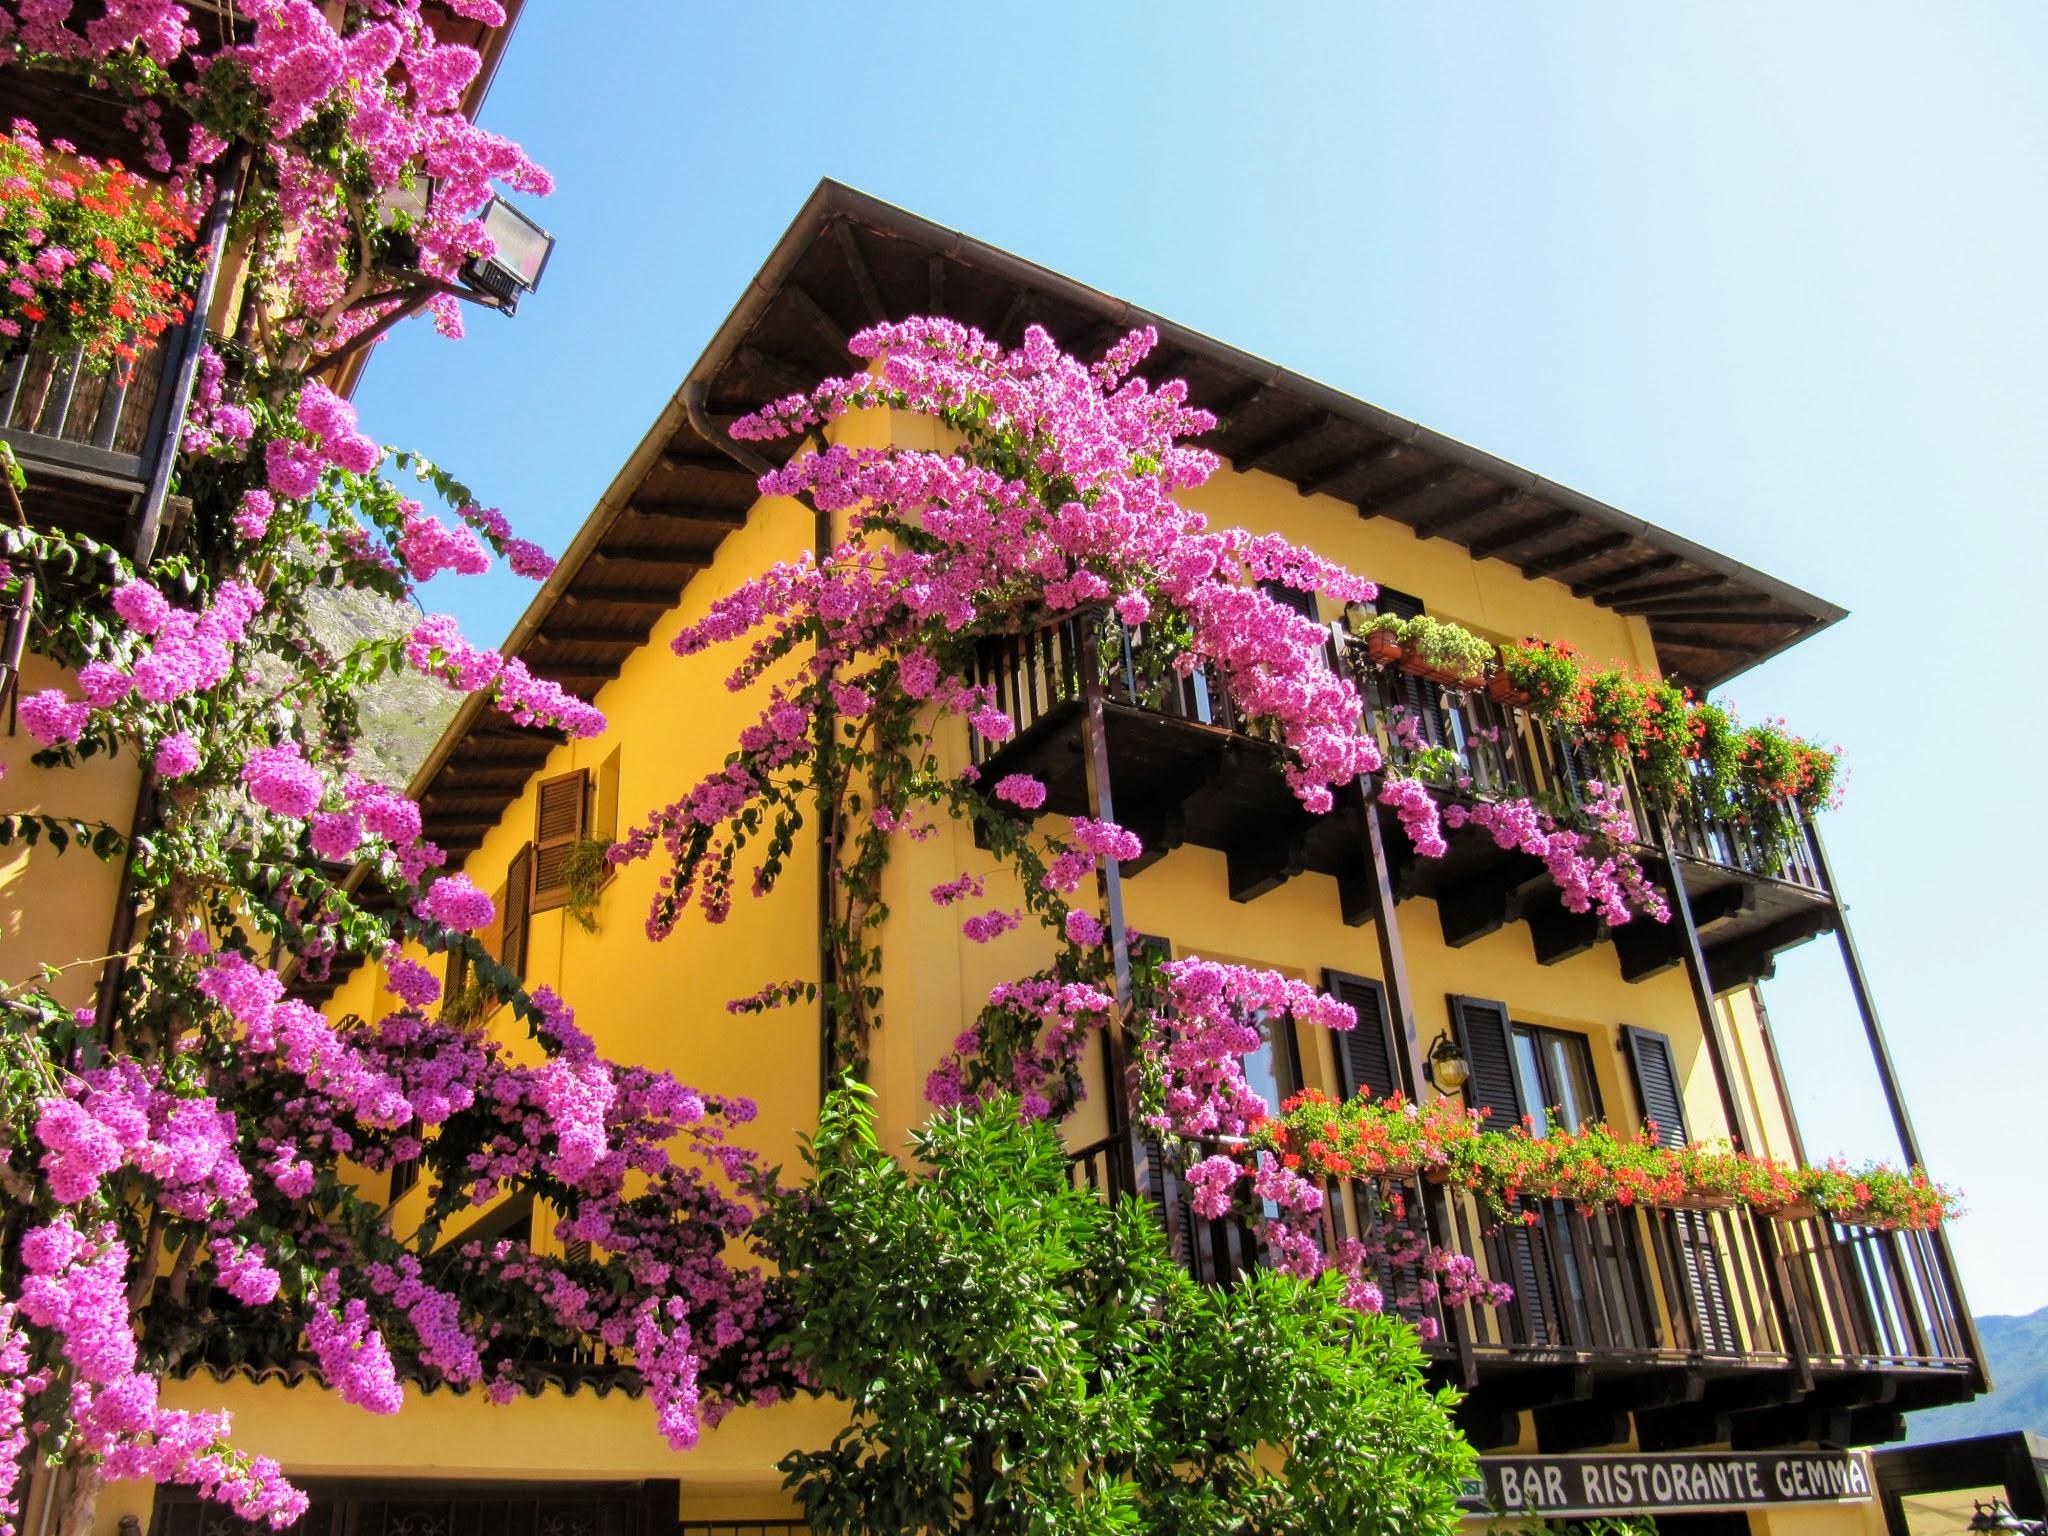 Gekleurde gevels in Limone sul Garda met bougainville